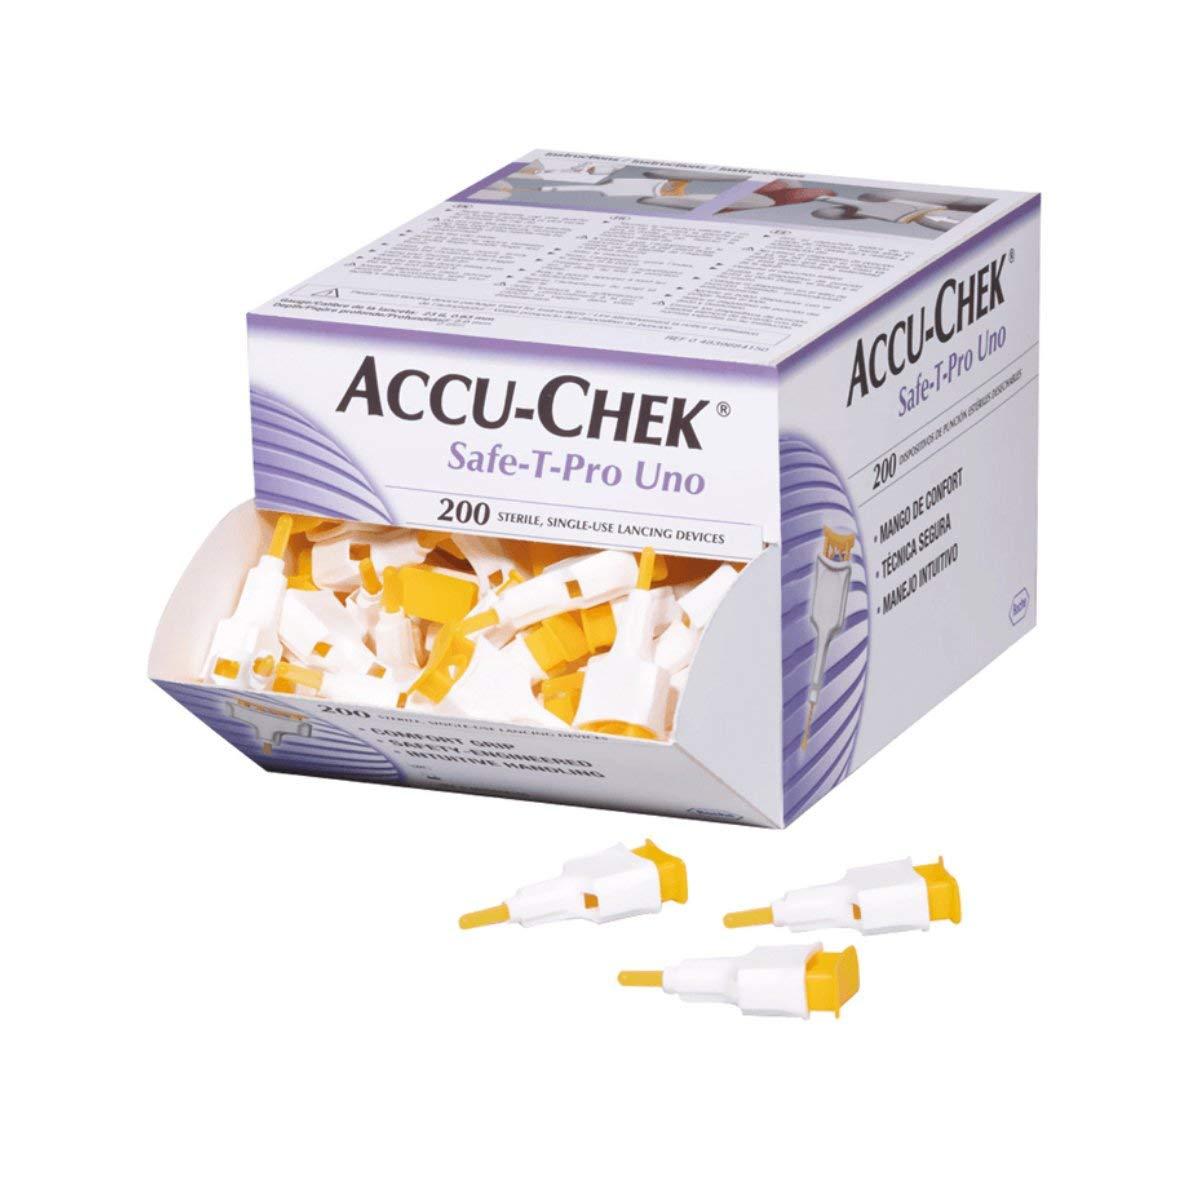 AccuChek SAFE-T PRO UNO 200 Lancets (Single Use Disposal Most Hygenic Lancets) (2 Pack - 200 Lancets)